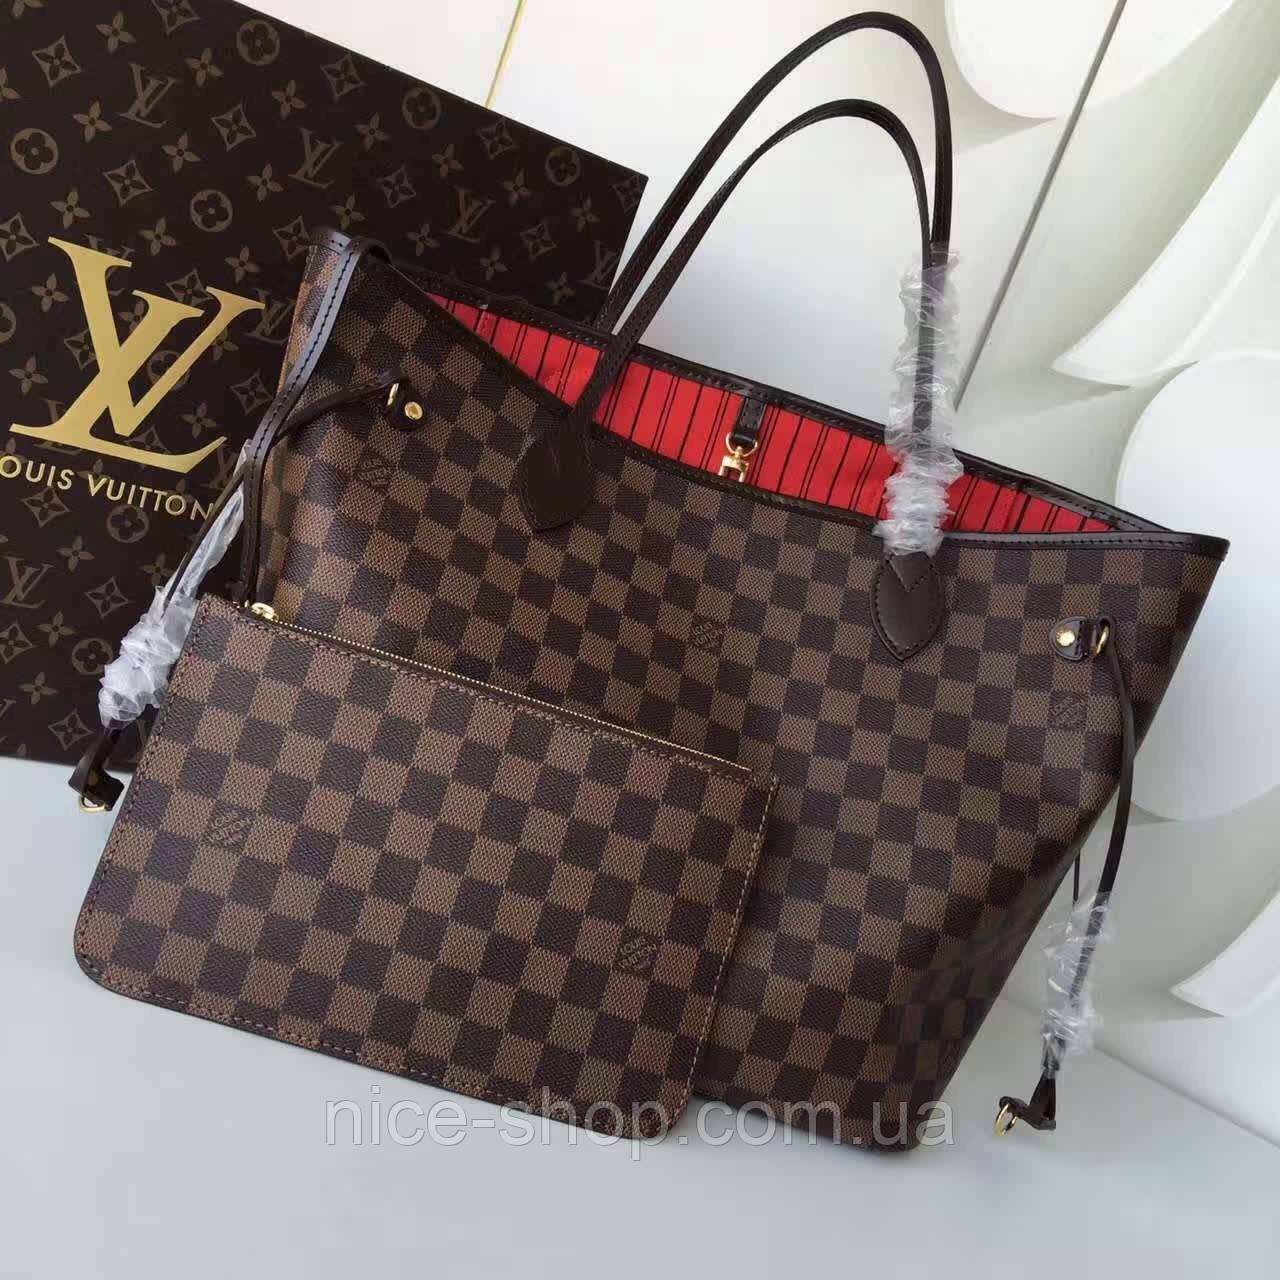 f6fed1abf1f6 Сумка Louis Vuitton Neverfull Medium кожа, коричневая шахматка ...